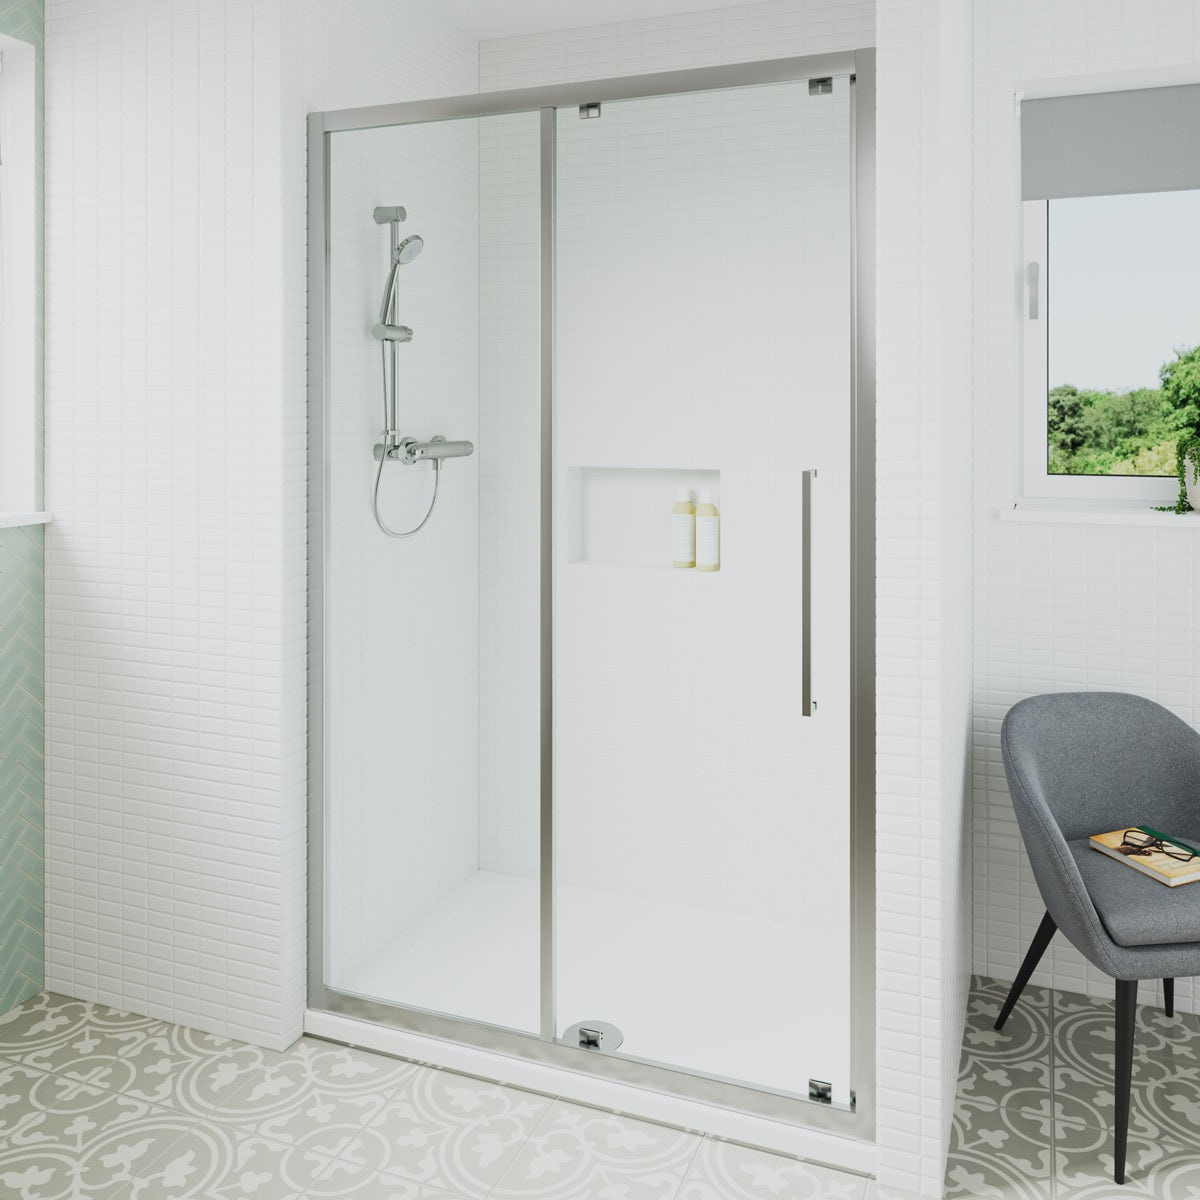 Ideal Standard 6mm sliding rectangular shower door with tray